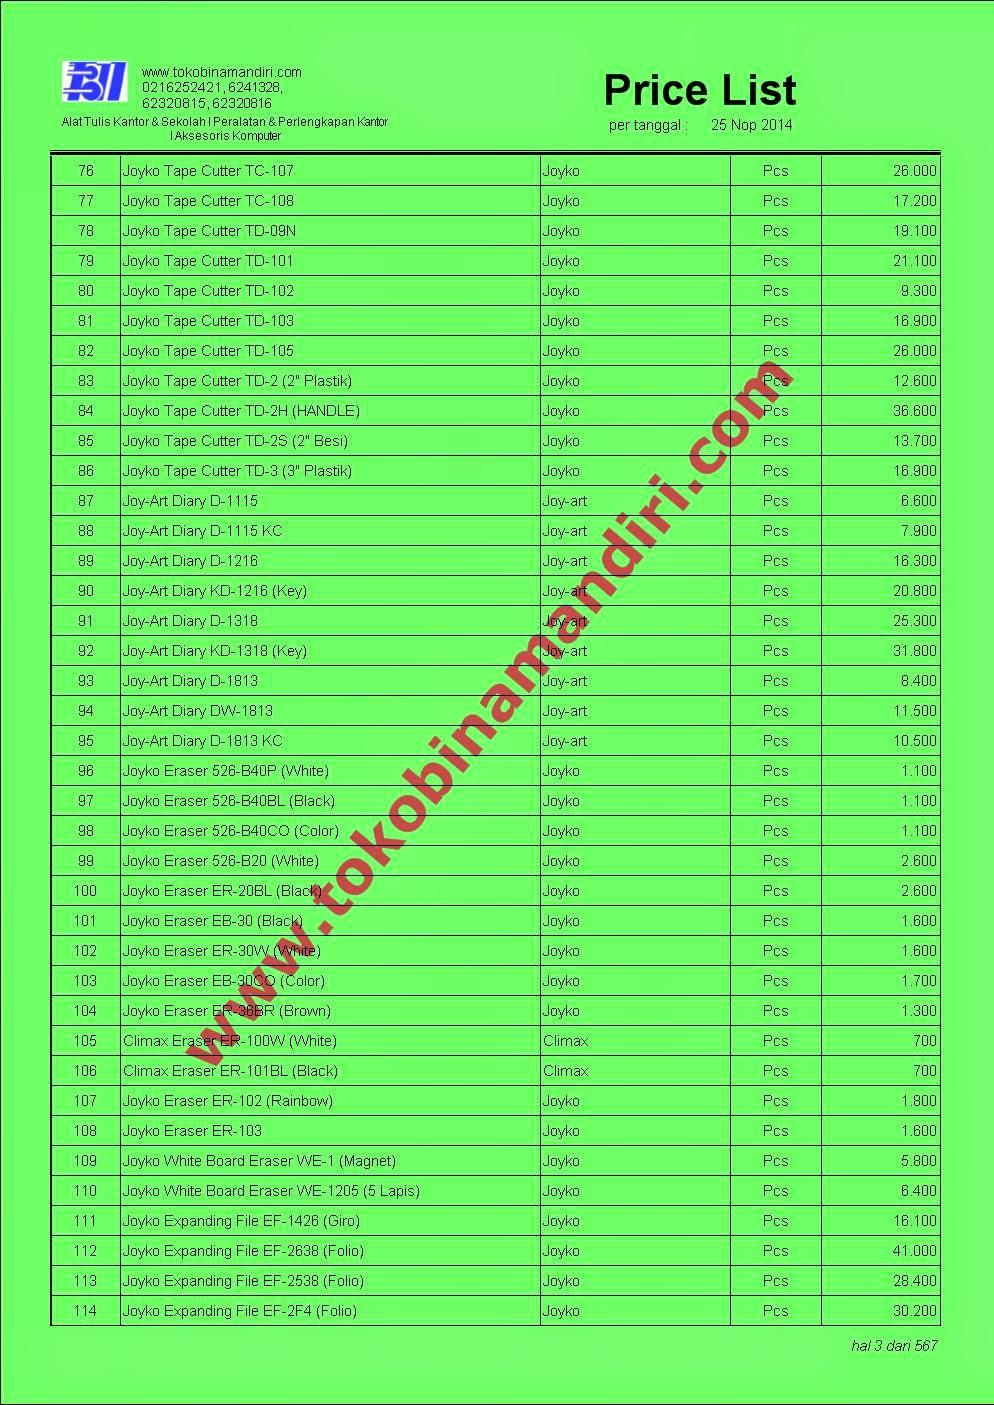 Daftar Harga ATK Joyko Tape Cutter, Diary, Eraser dll